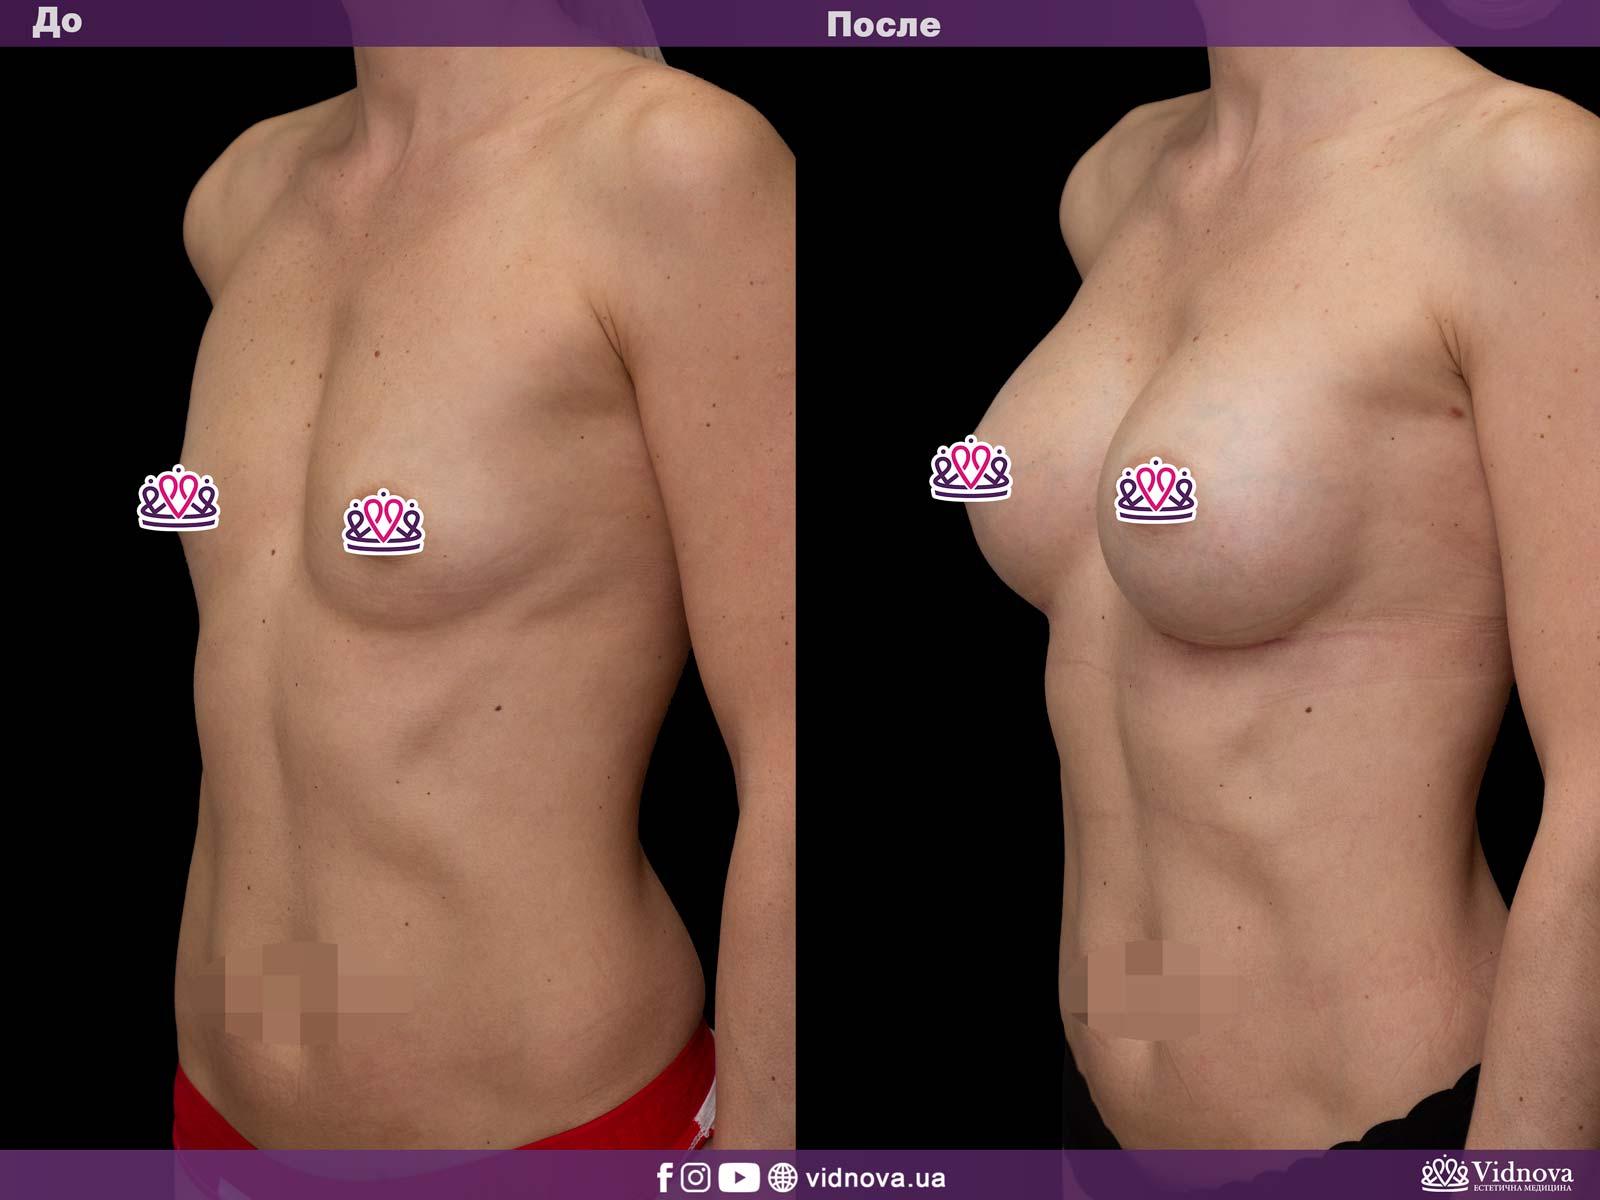 Увеличение груди: Фото ДО и ПОСЛЕ - Пример №22-2 - Клиника Vidnova